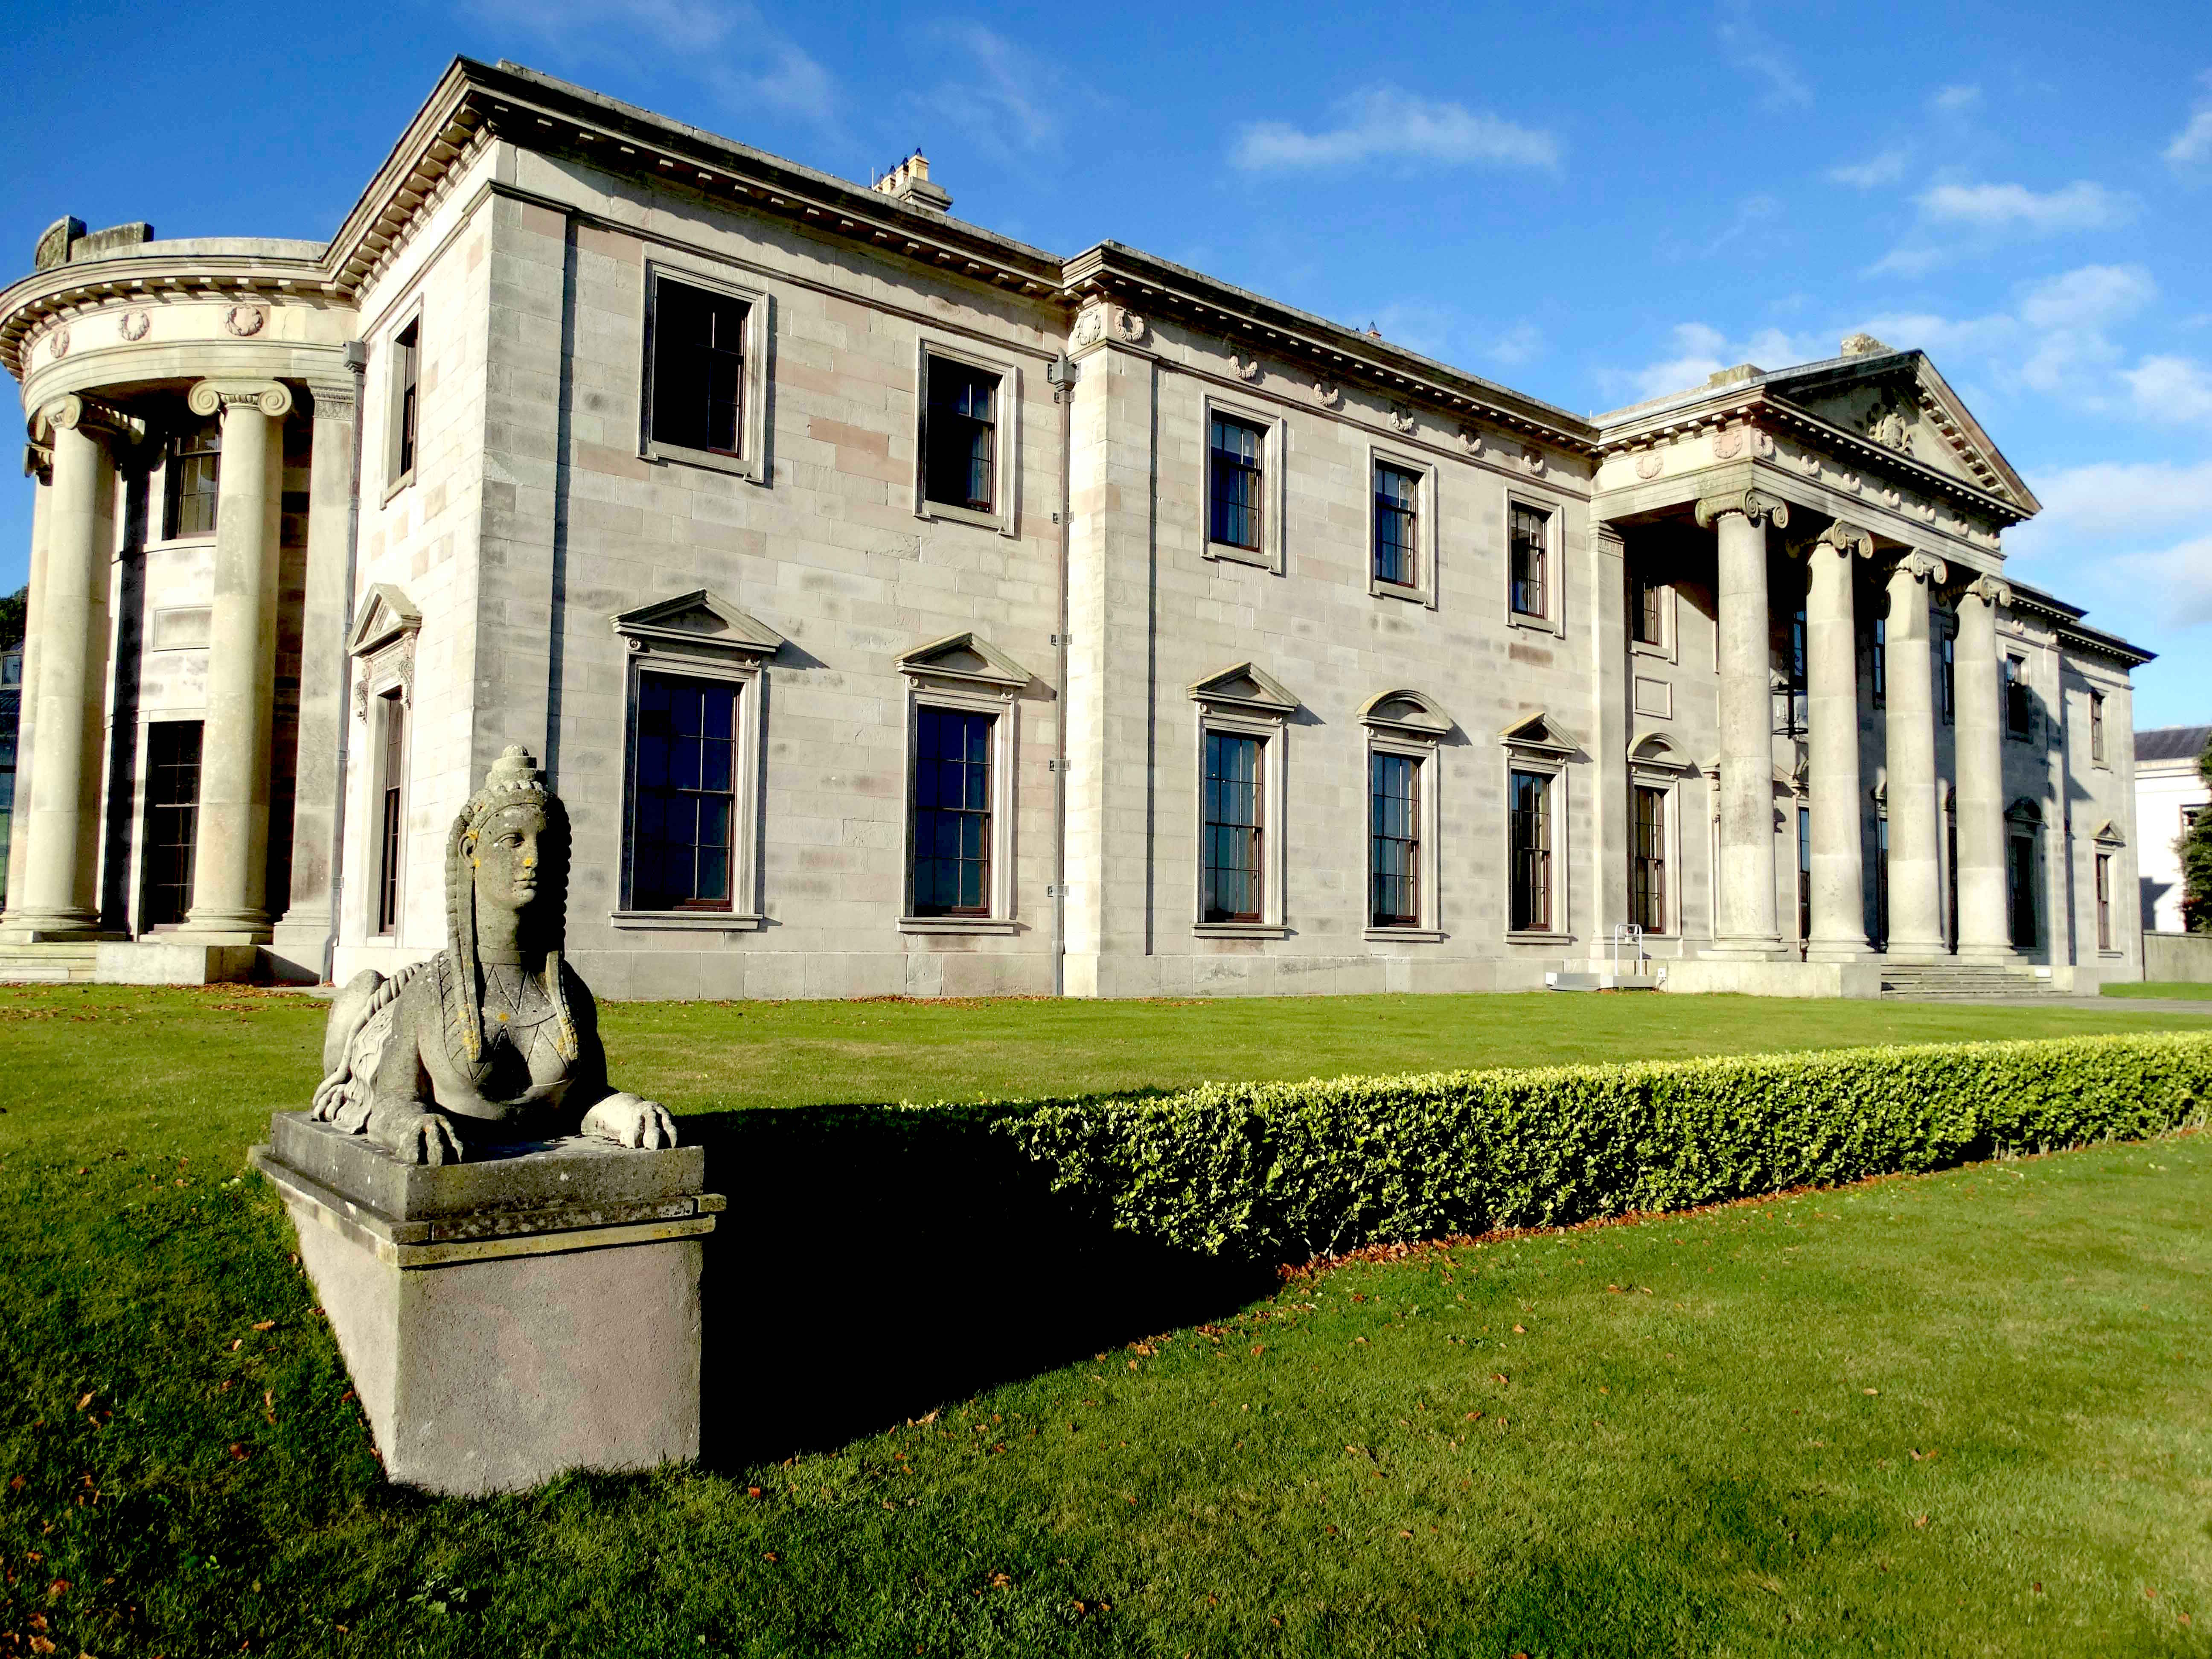 Ballyfin House in Ireland